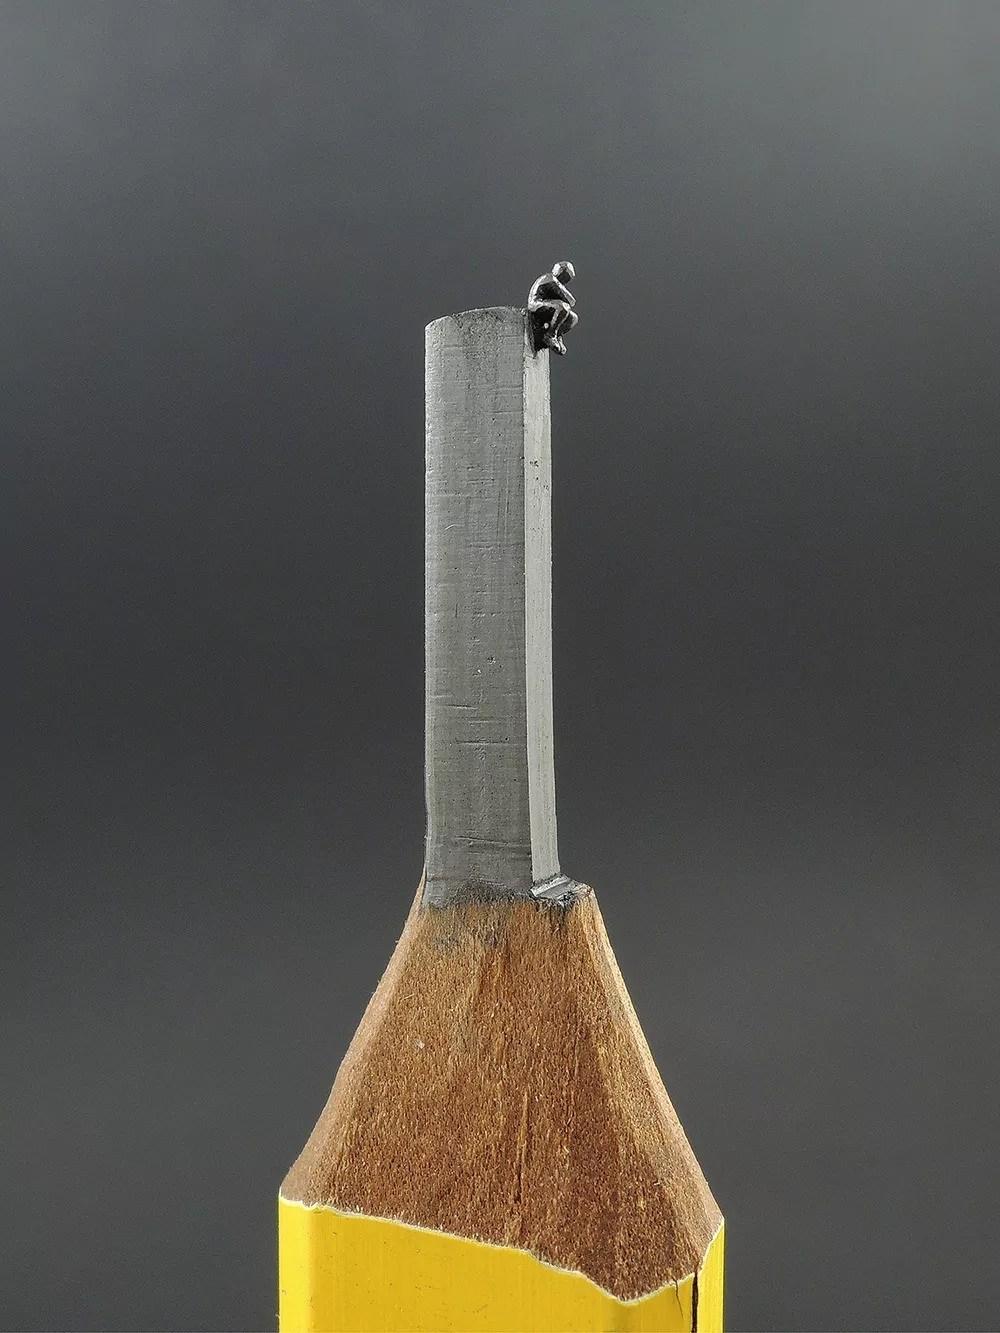 DSCN3933x - New Way of Using Pencil - Jasenko Djordjevic